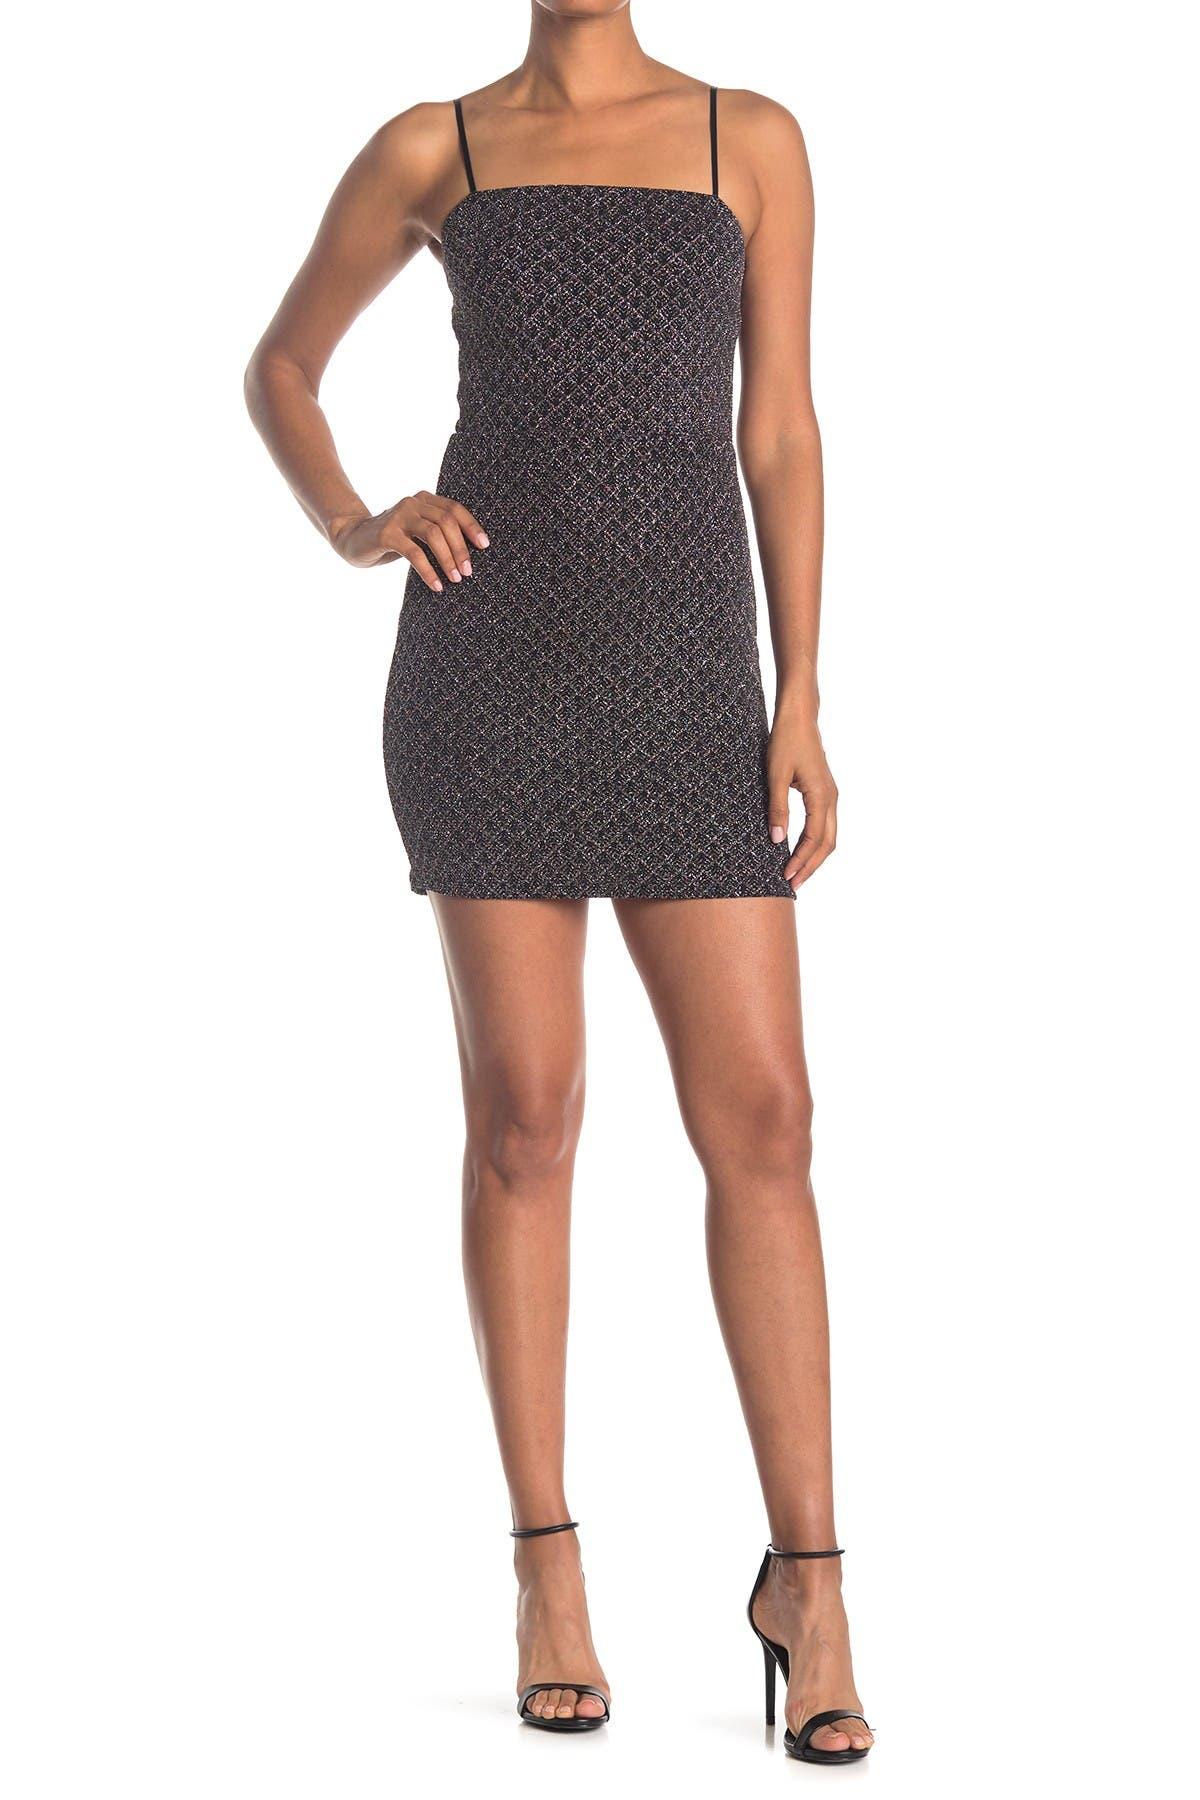 Image of ROW A Glitter Strap Mini Dress